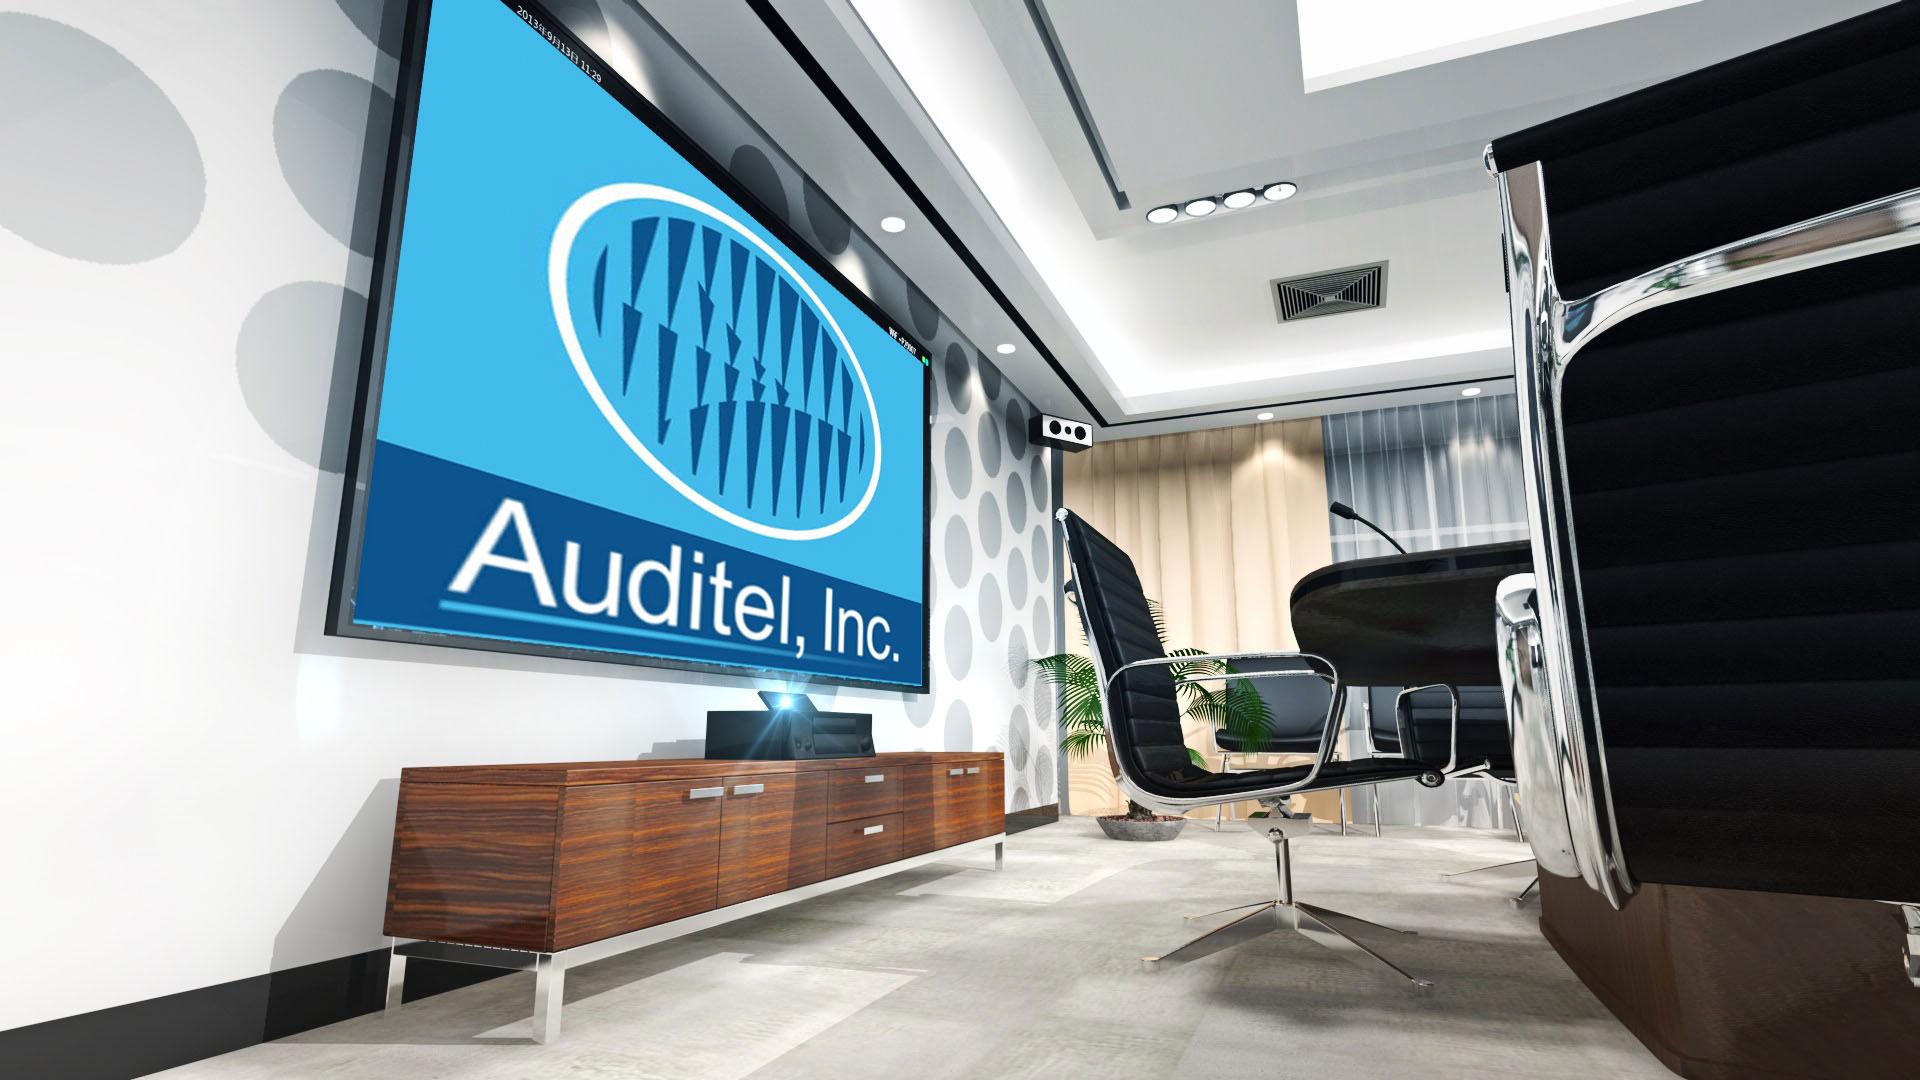 Contact Auditel